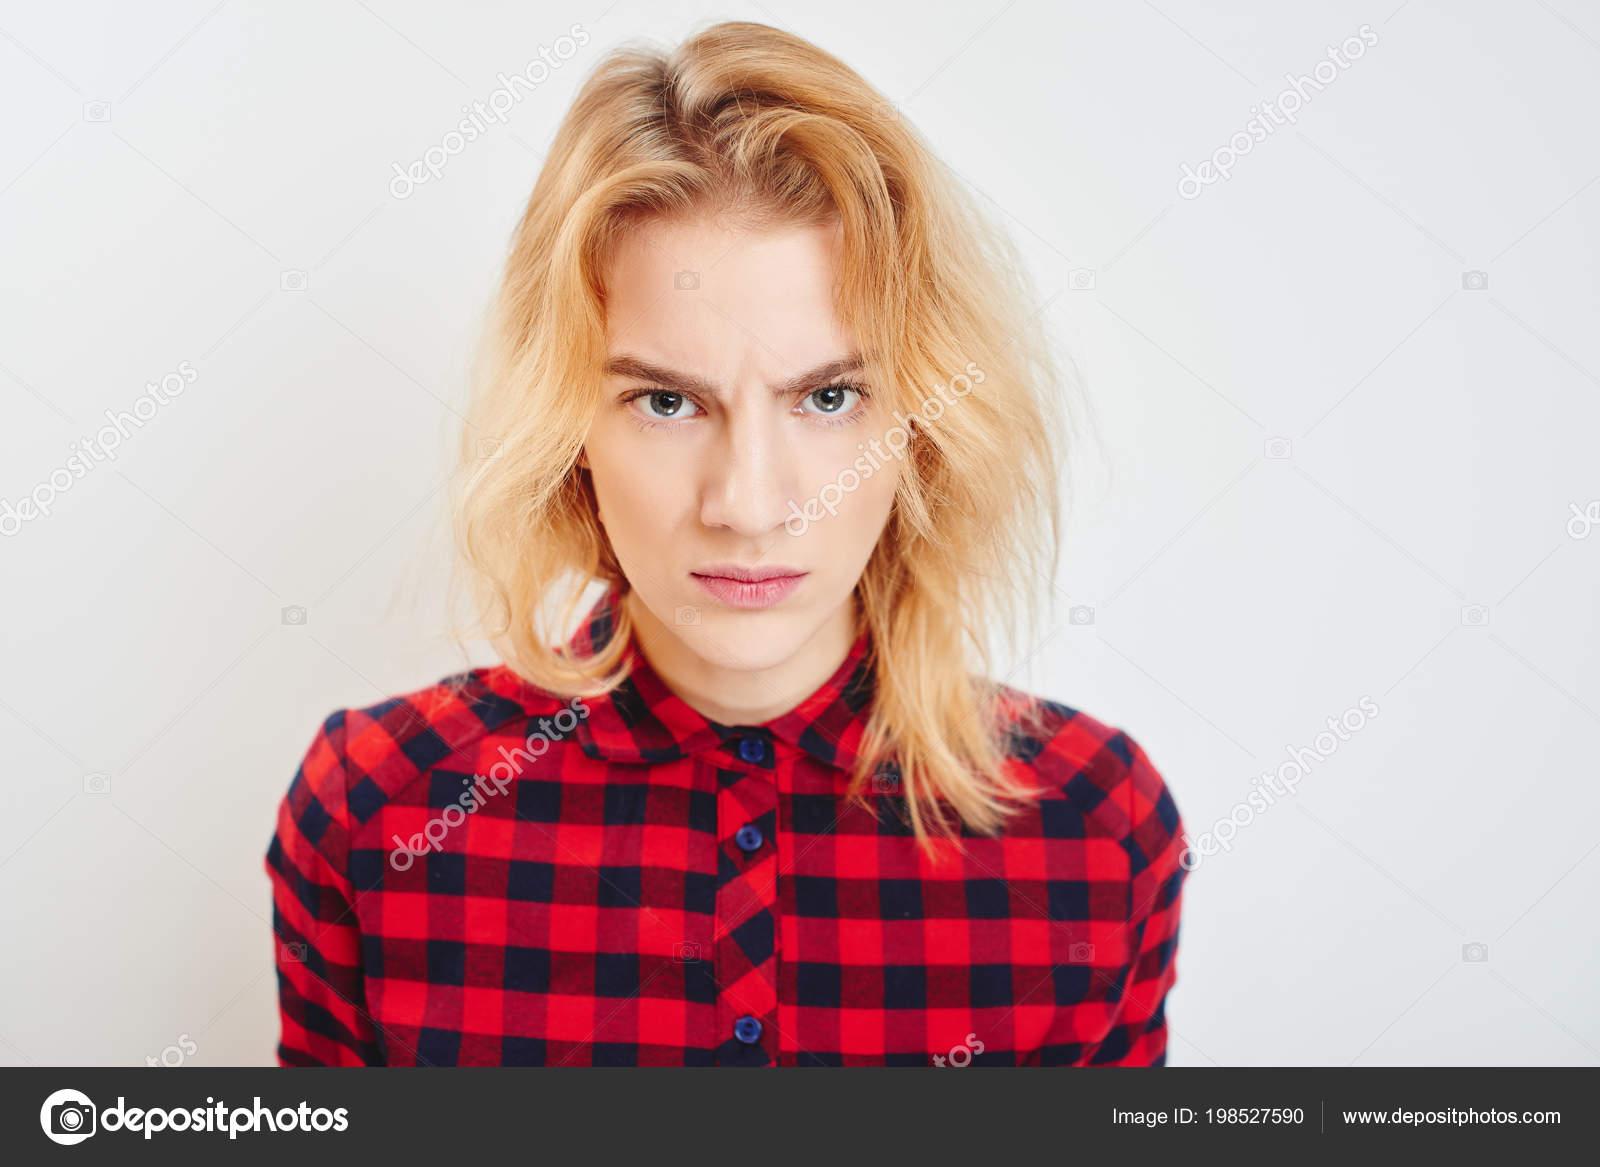 Foto Mujer Resentimiento De Descontento Emoción Expresión Retrato Con Camisa Joven Cuadros Stock — 1dvqwvS